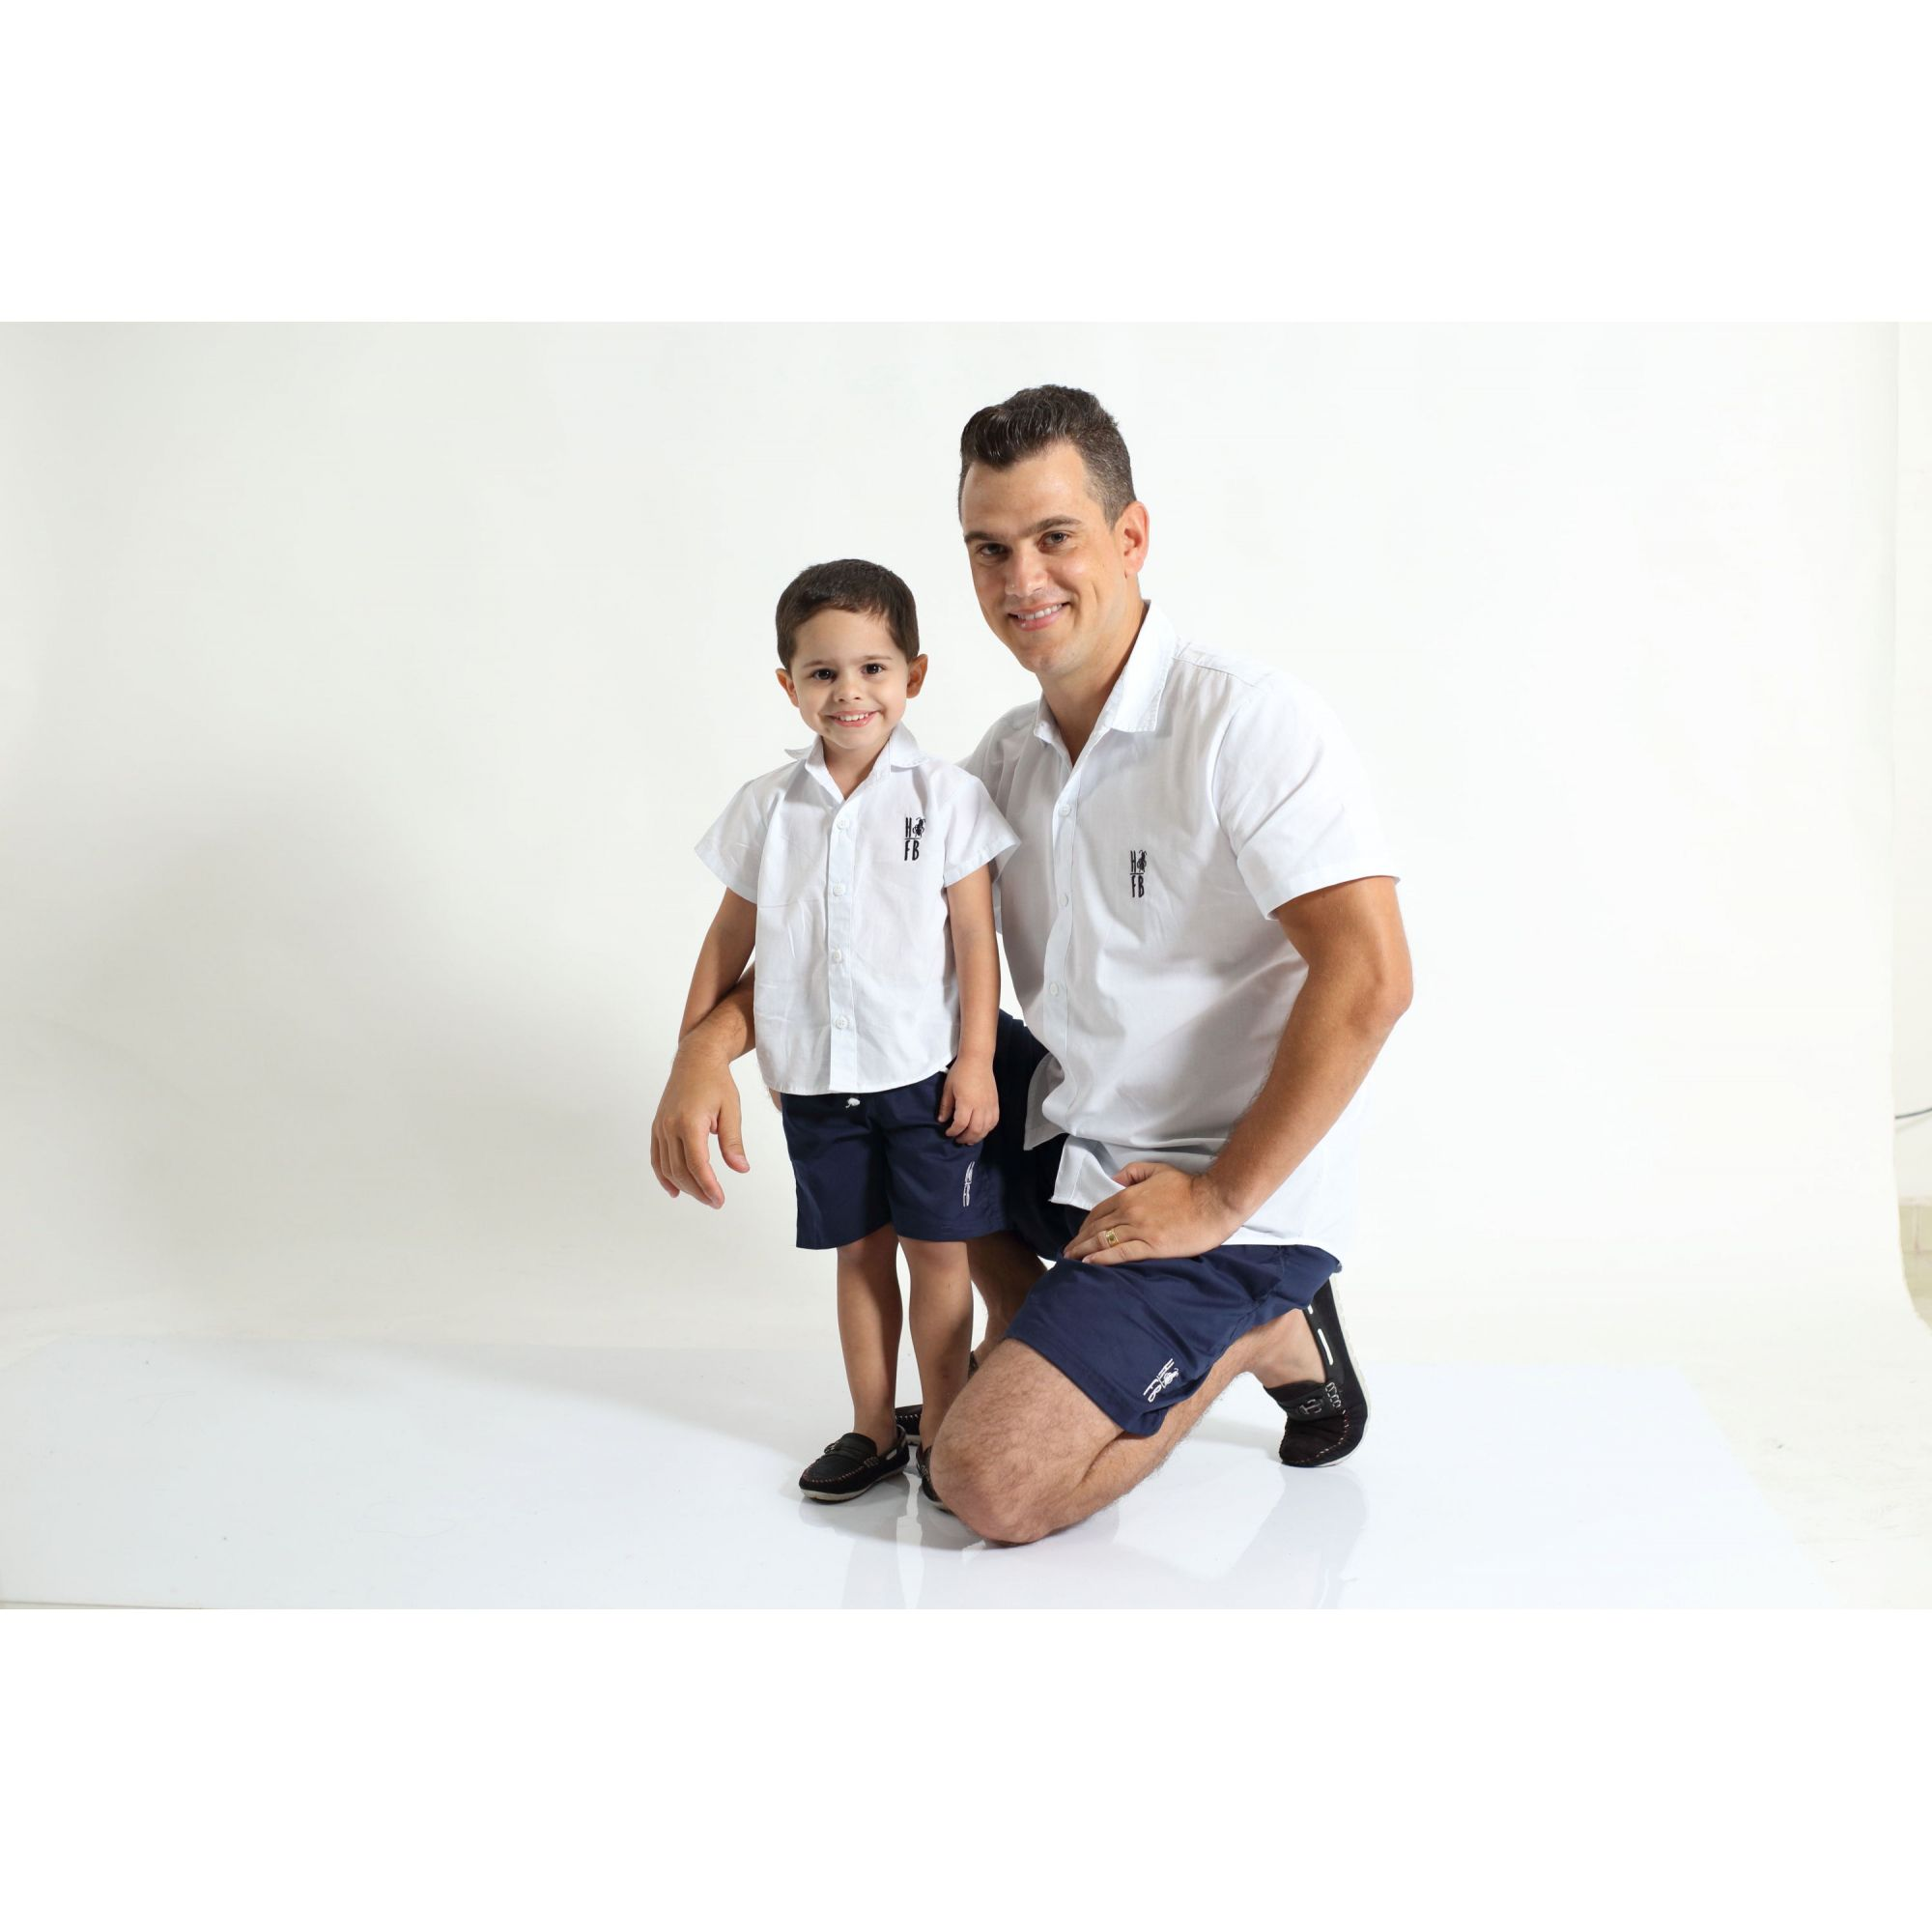 PAI E FILHO > Kit 02 Camisas Manga Curta Branca  [Coleção Tal Pai Tal Filho]  - Heitor Fashion Brazil